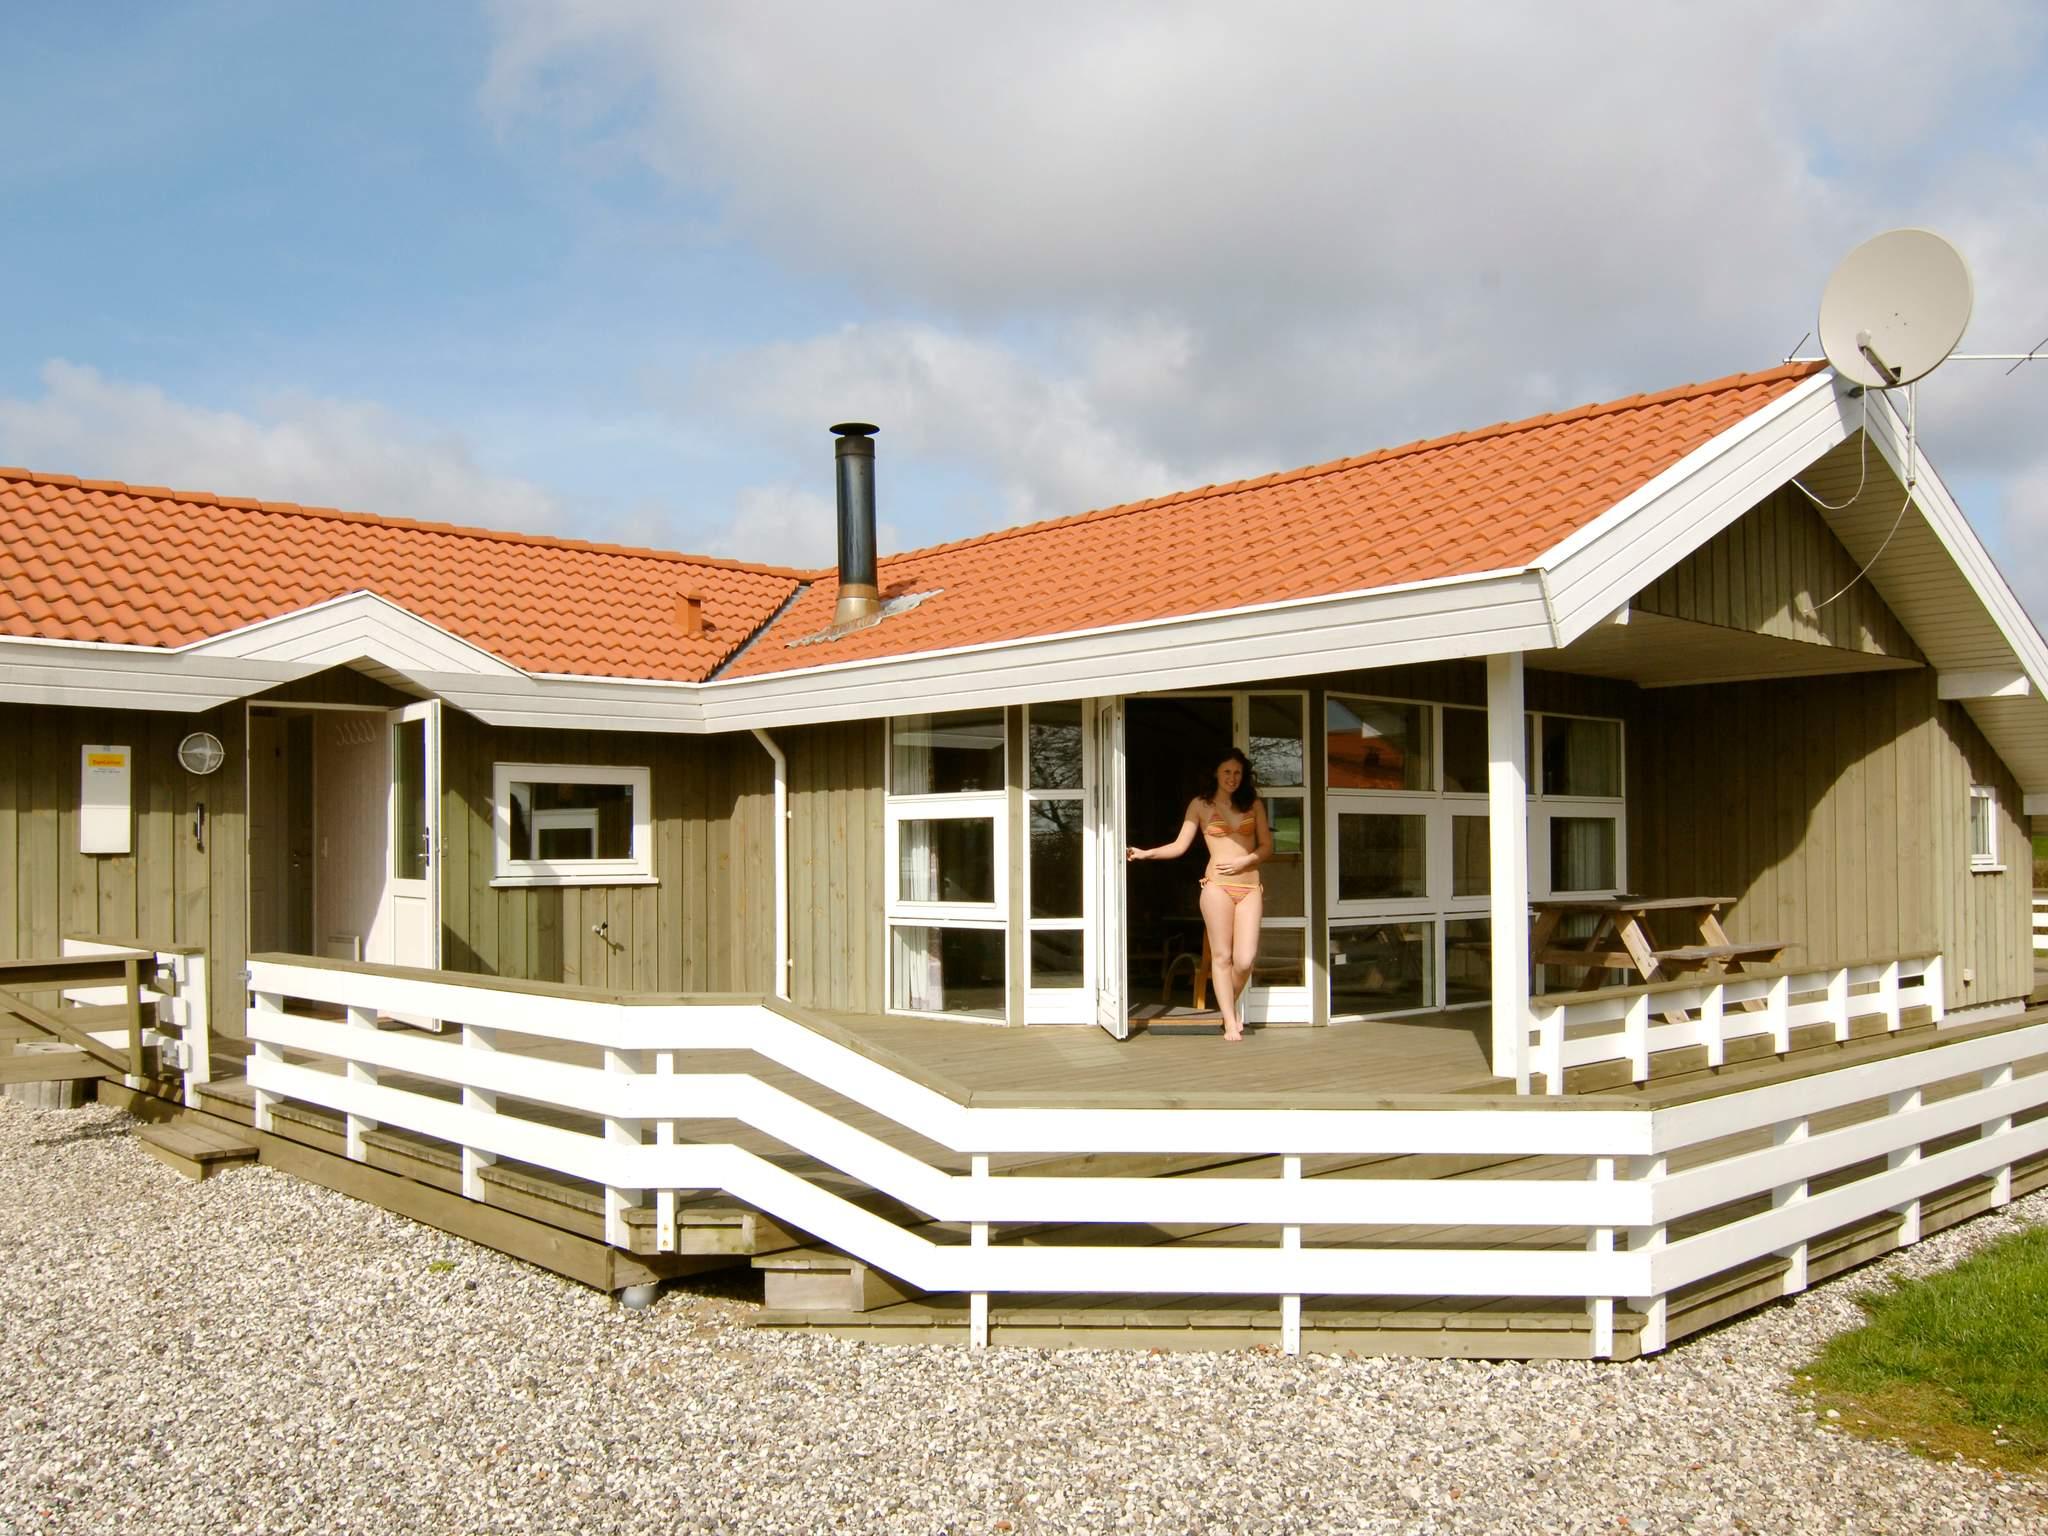 Ferienhaus Mørkholt (125852), Mørkholt, , Ostjütland, Dänemark, Bild 10